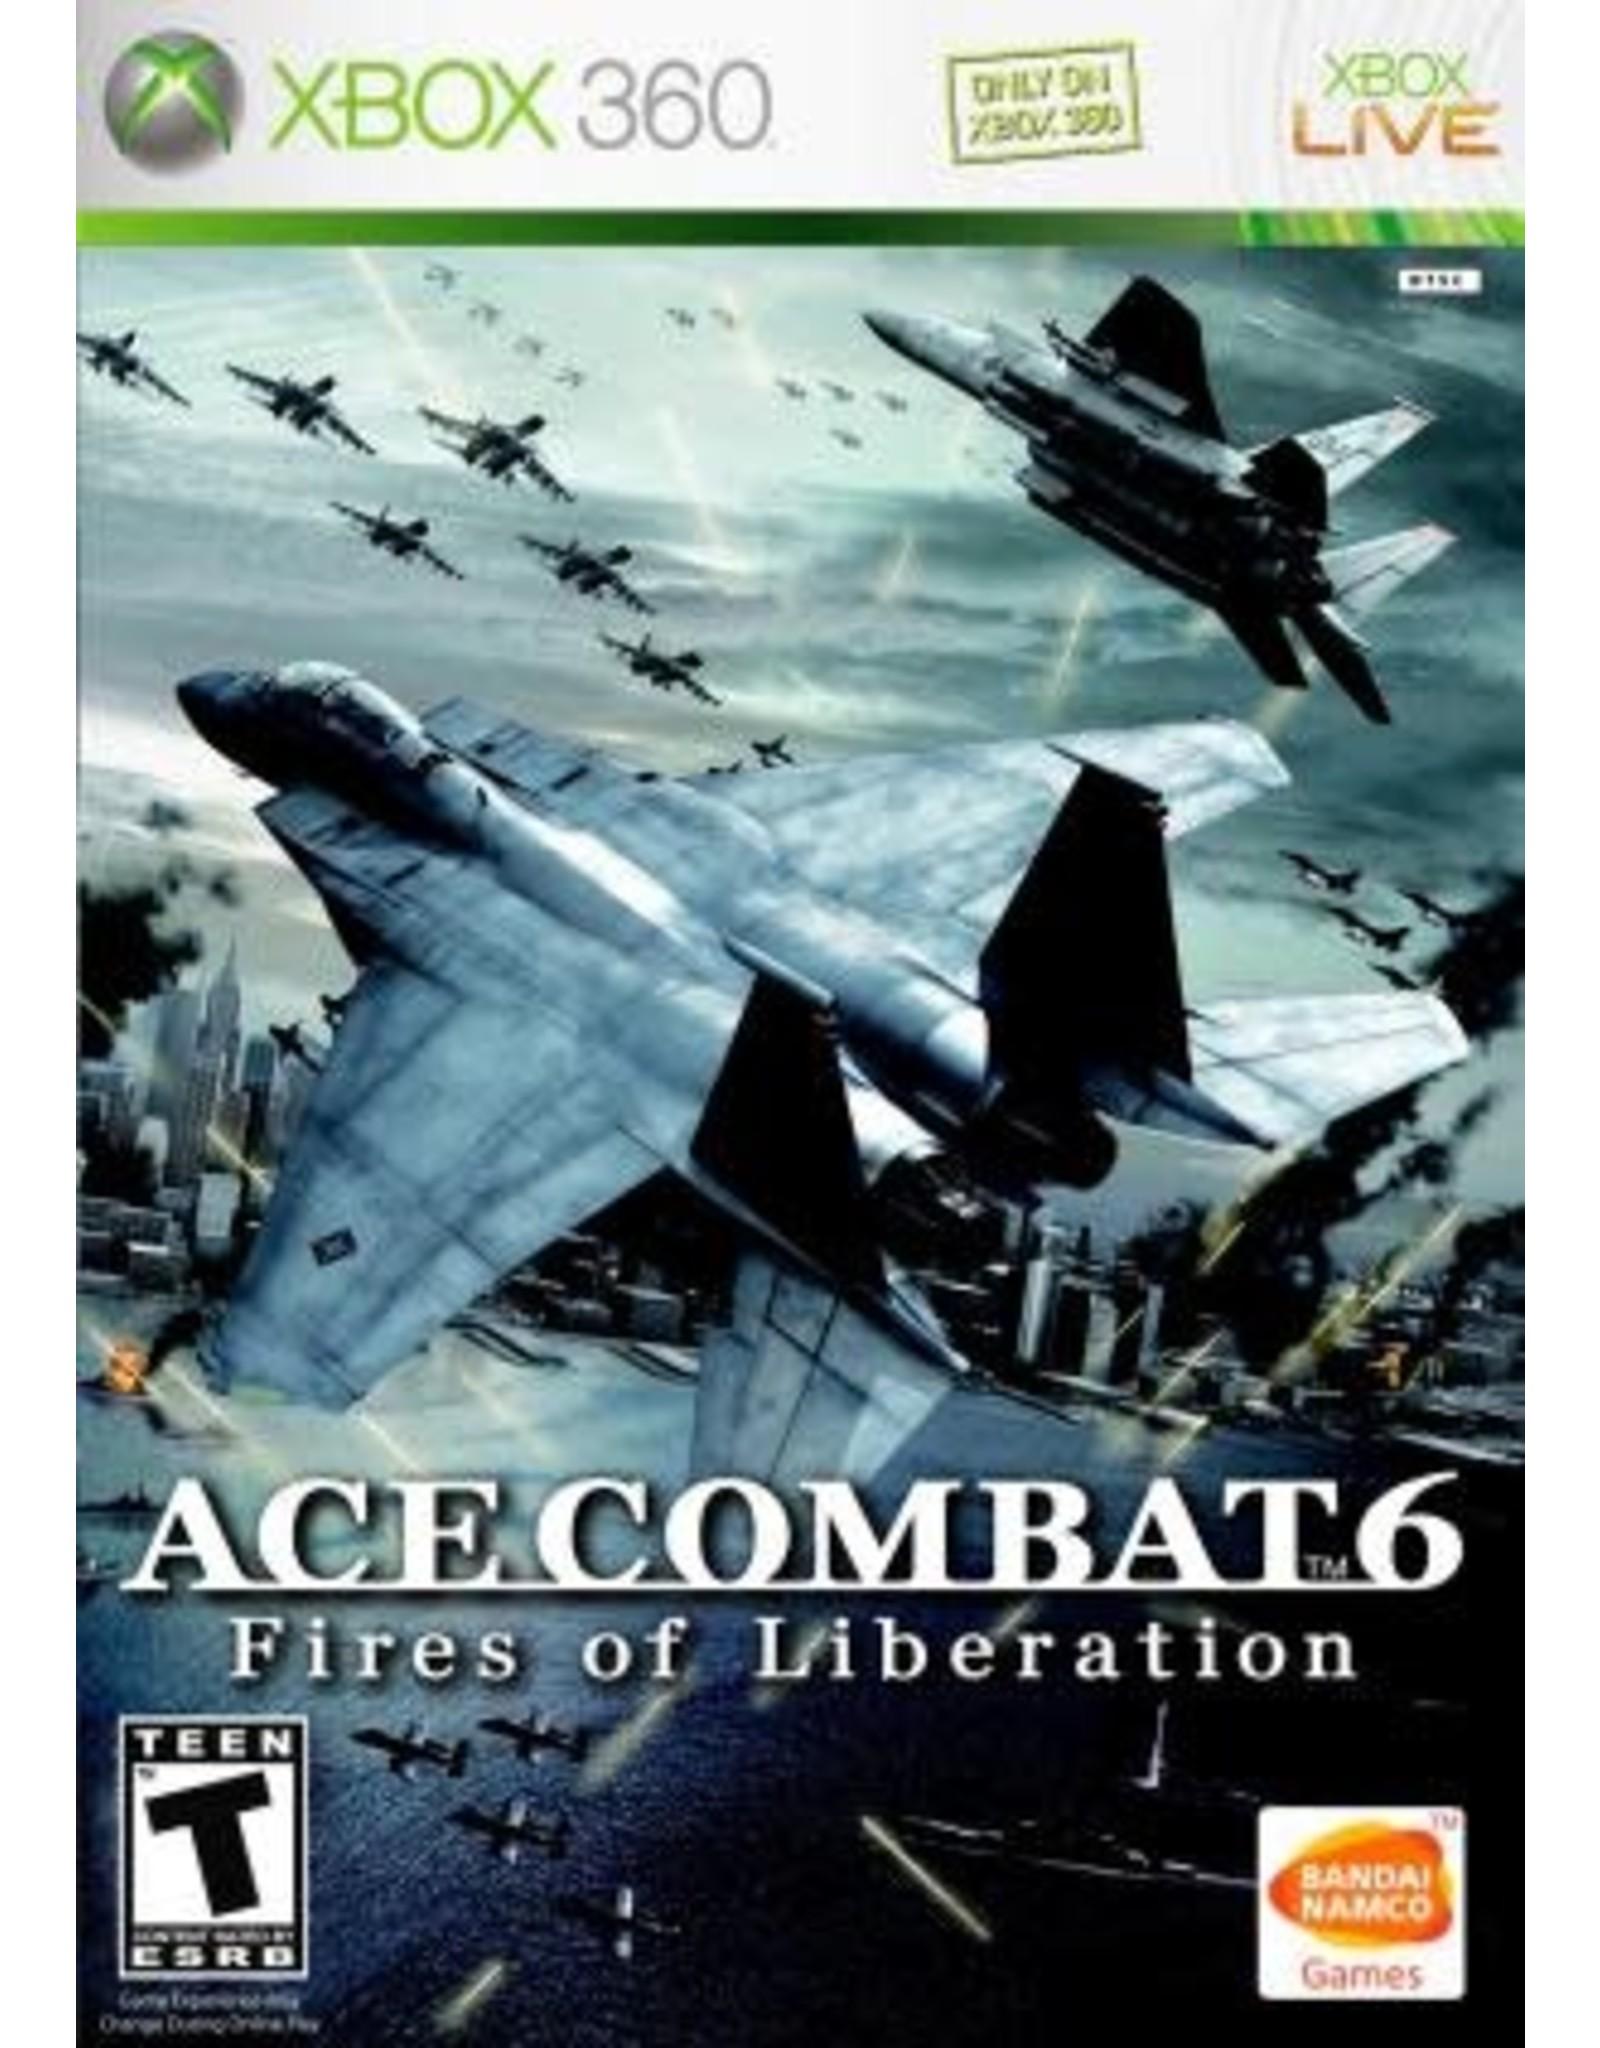 Xbox 360 Ace Combat 6 Fires of Liberation (CIB)